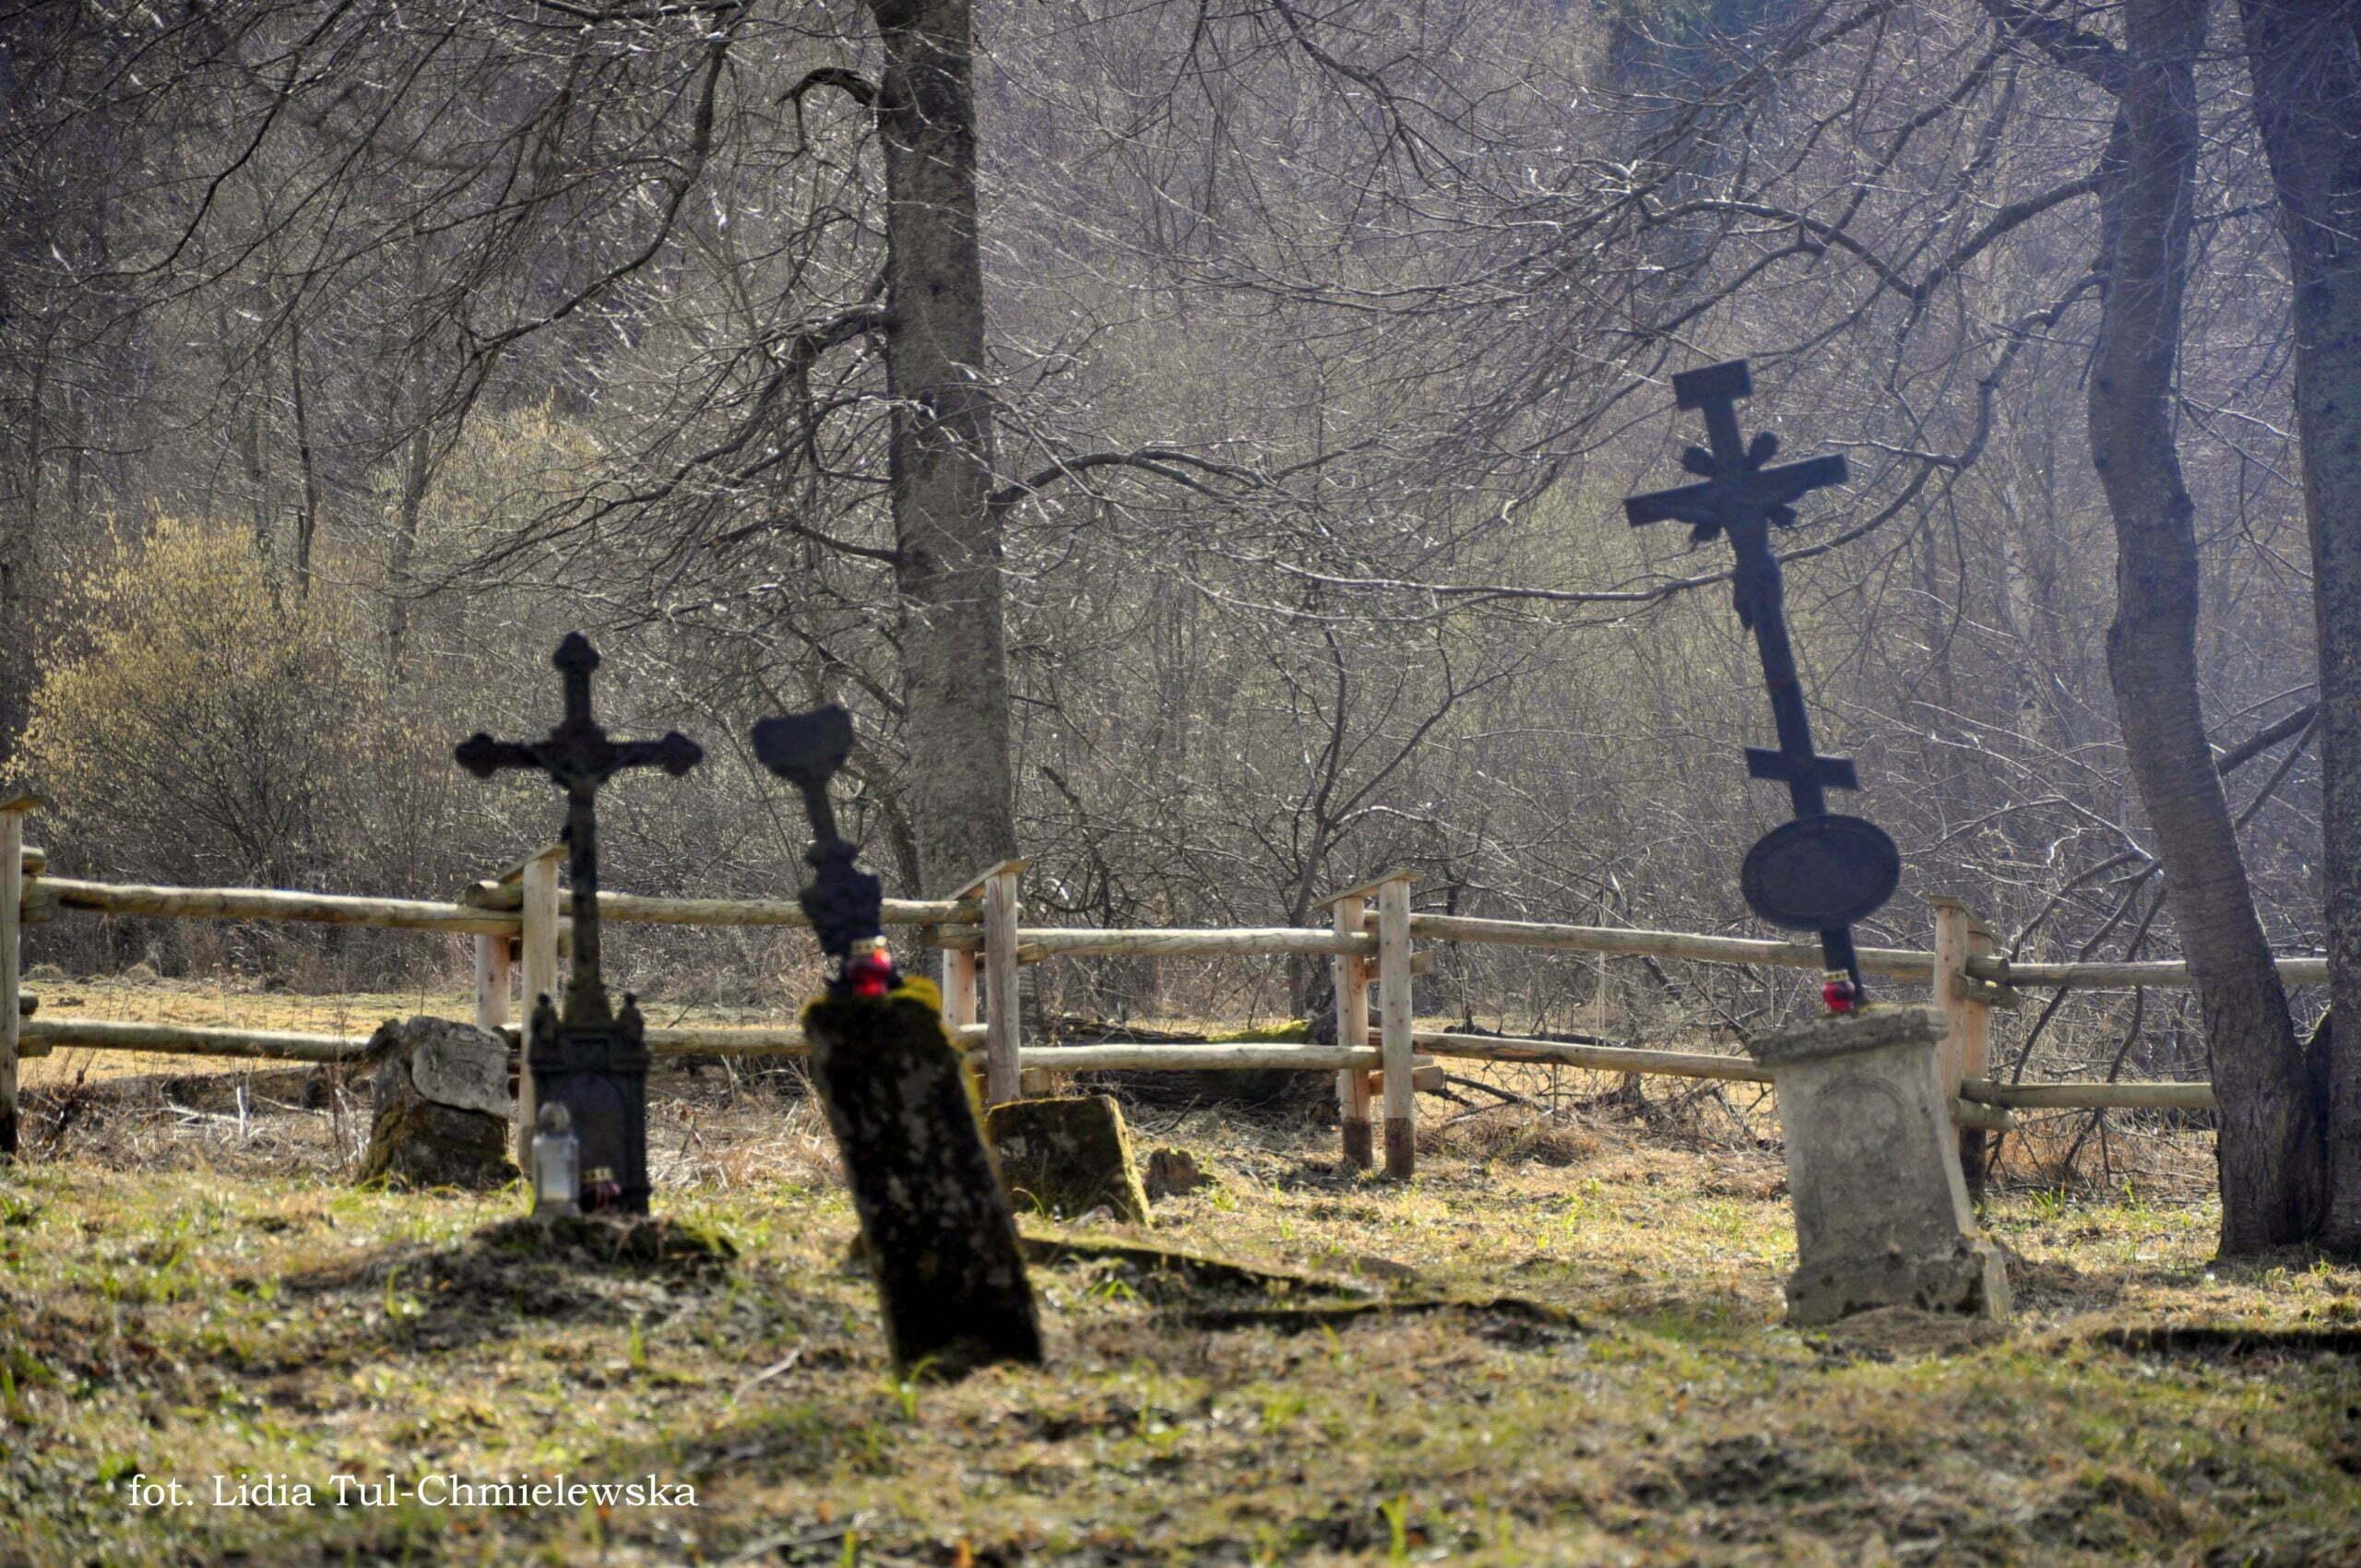 Cmentarz na Tworylnym fot. Lidia Tul-Chmielewska